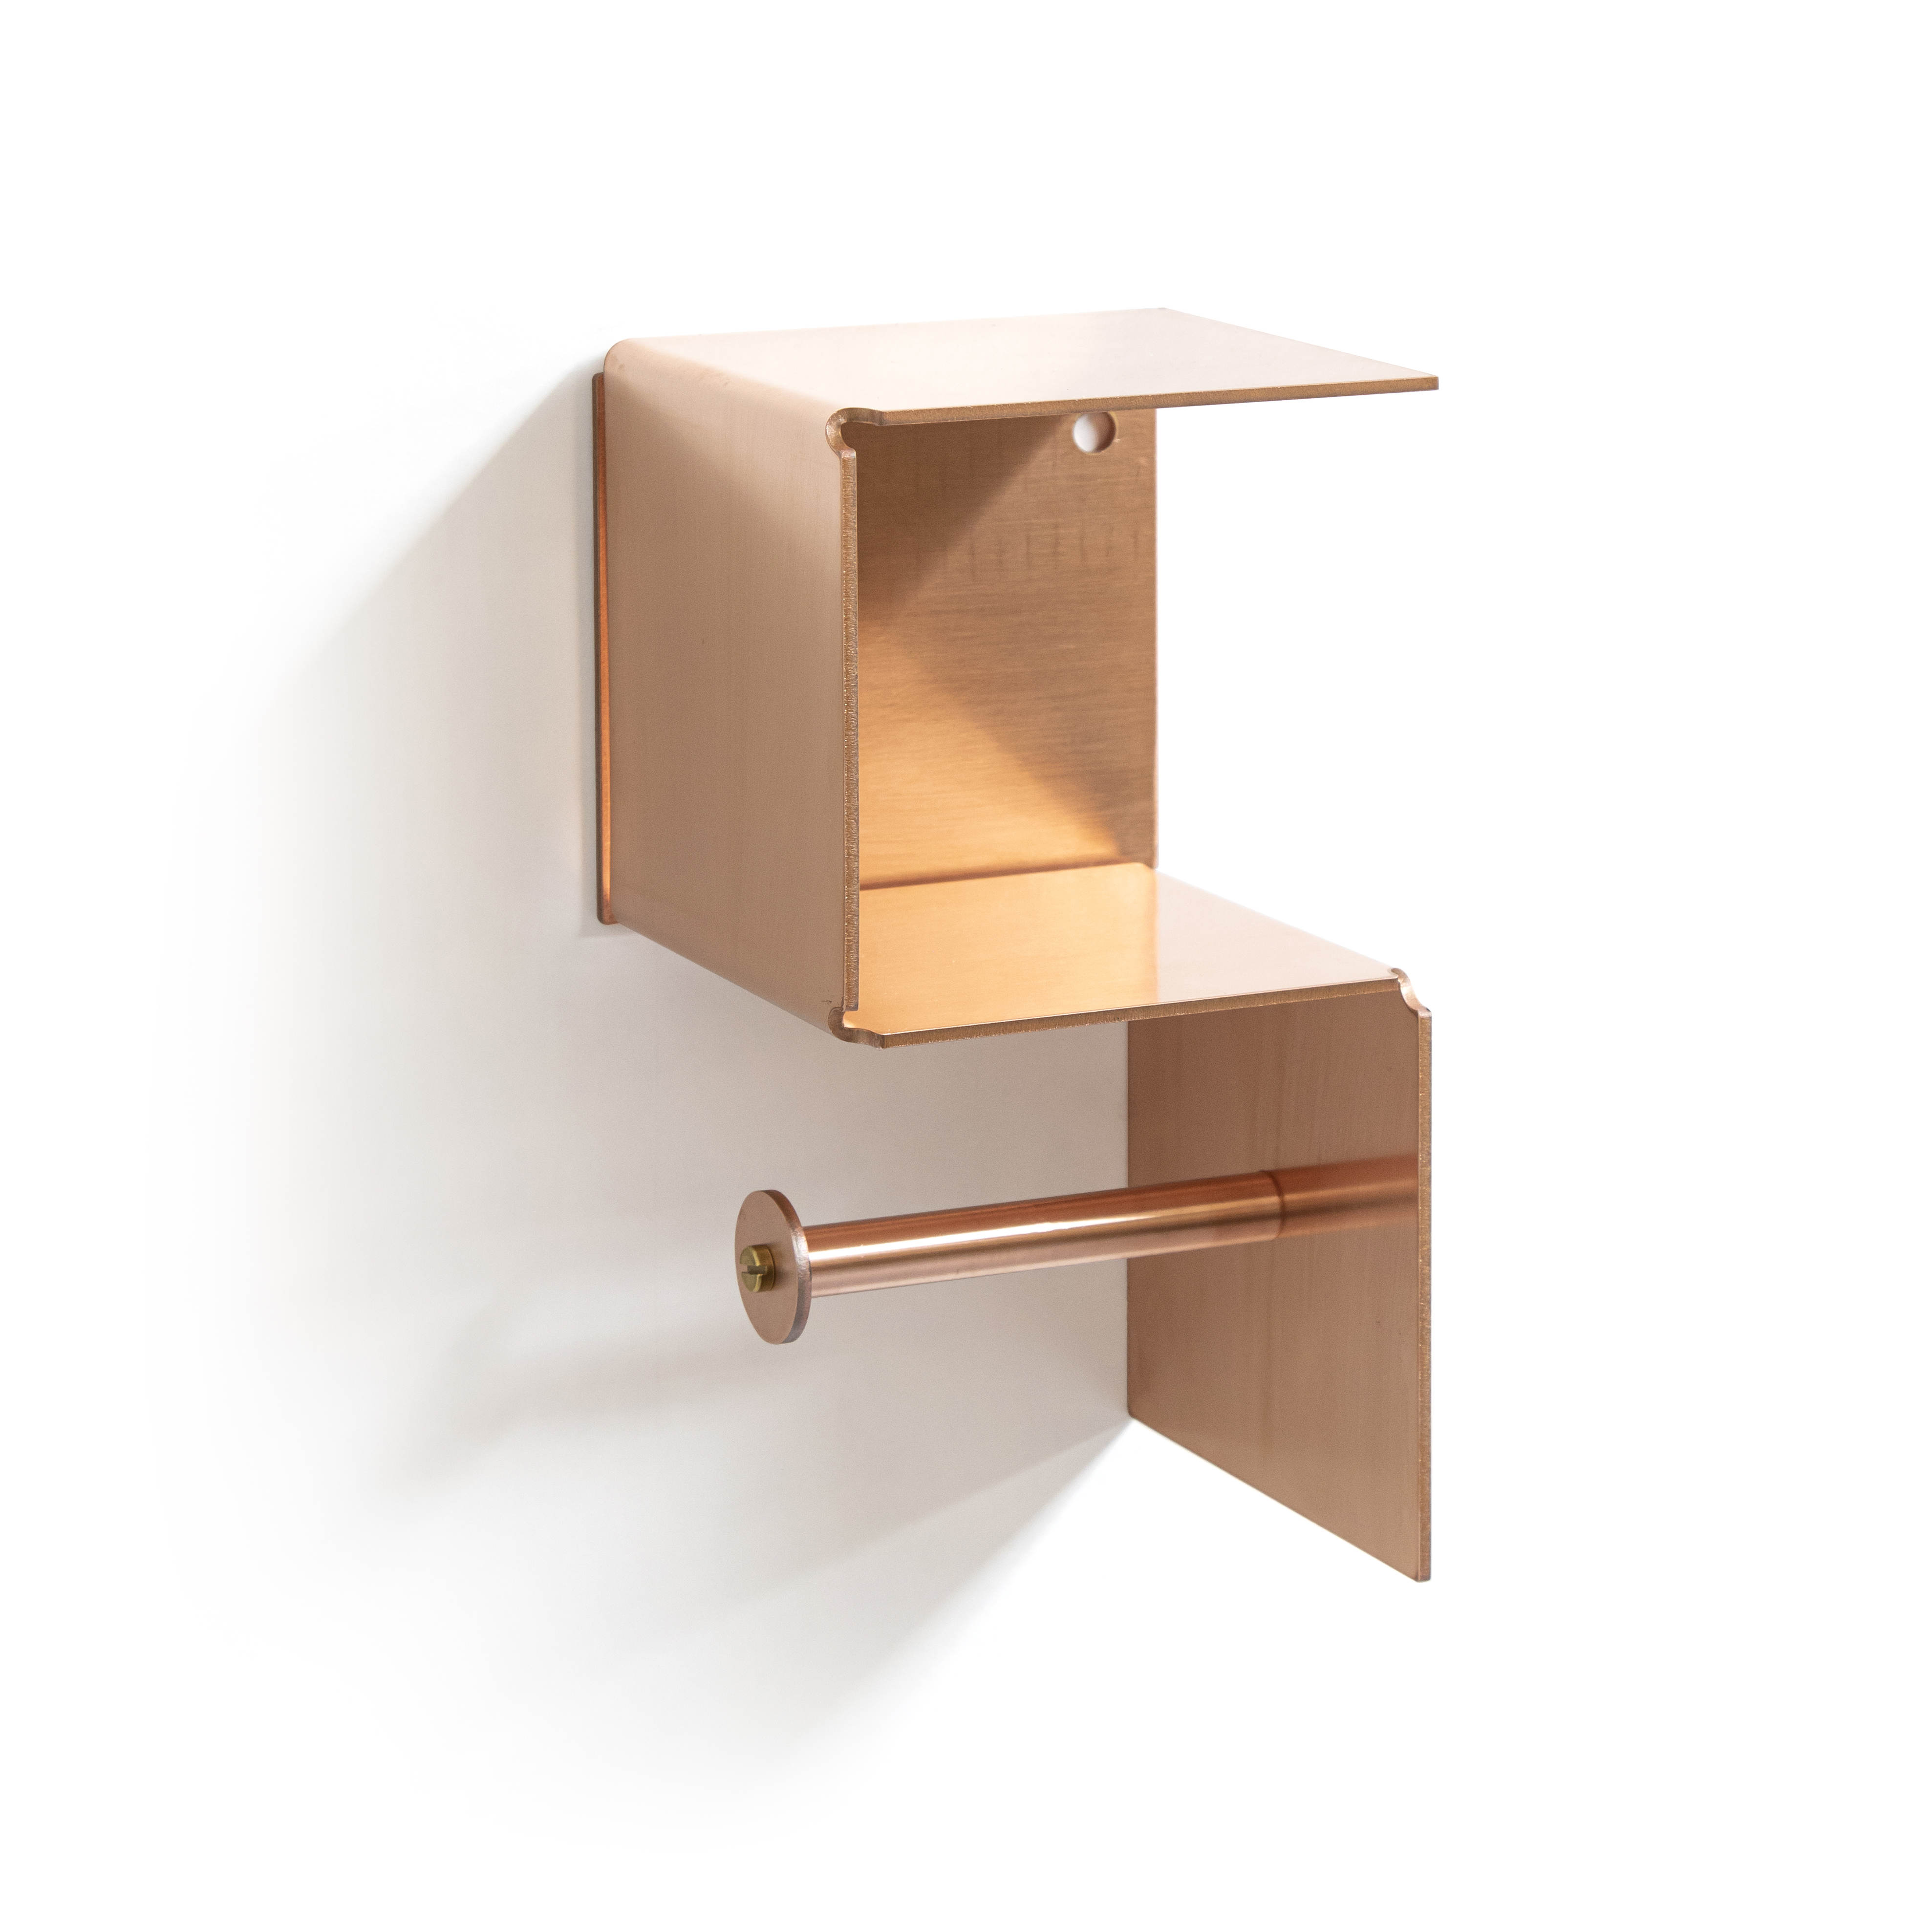 02_Toilet_Paper_Holder_Vertical_copper01_THUMBNAIL-3